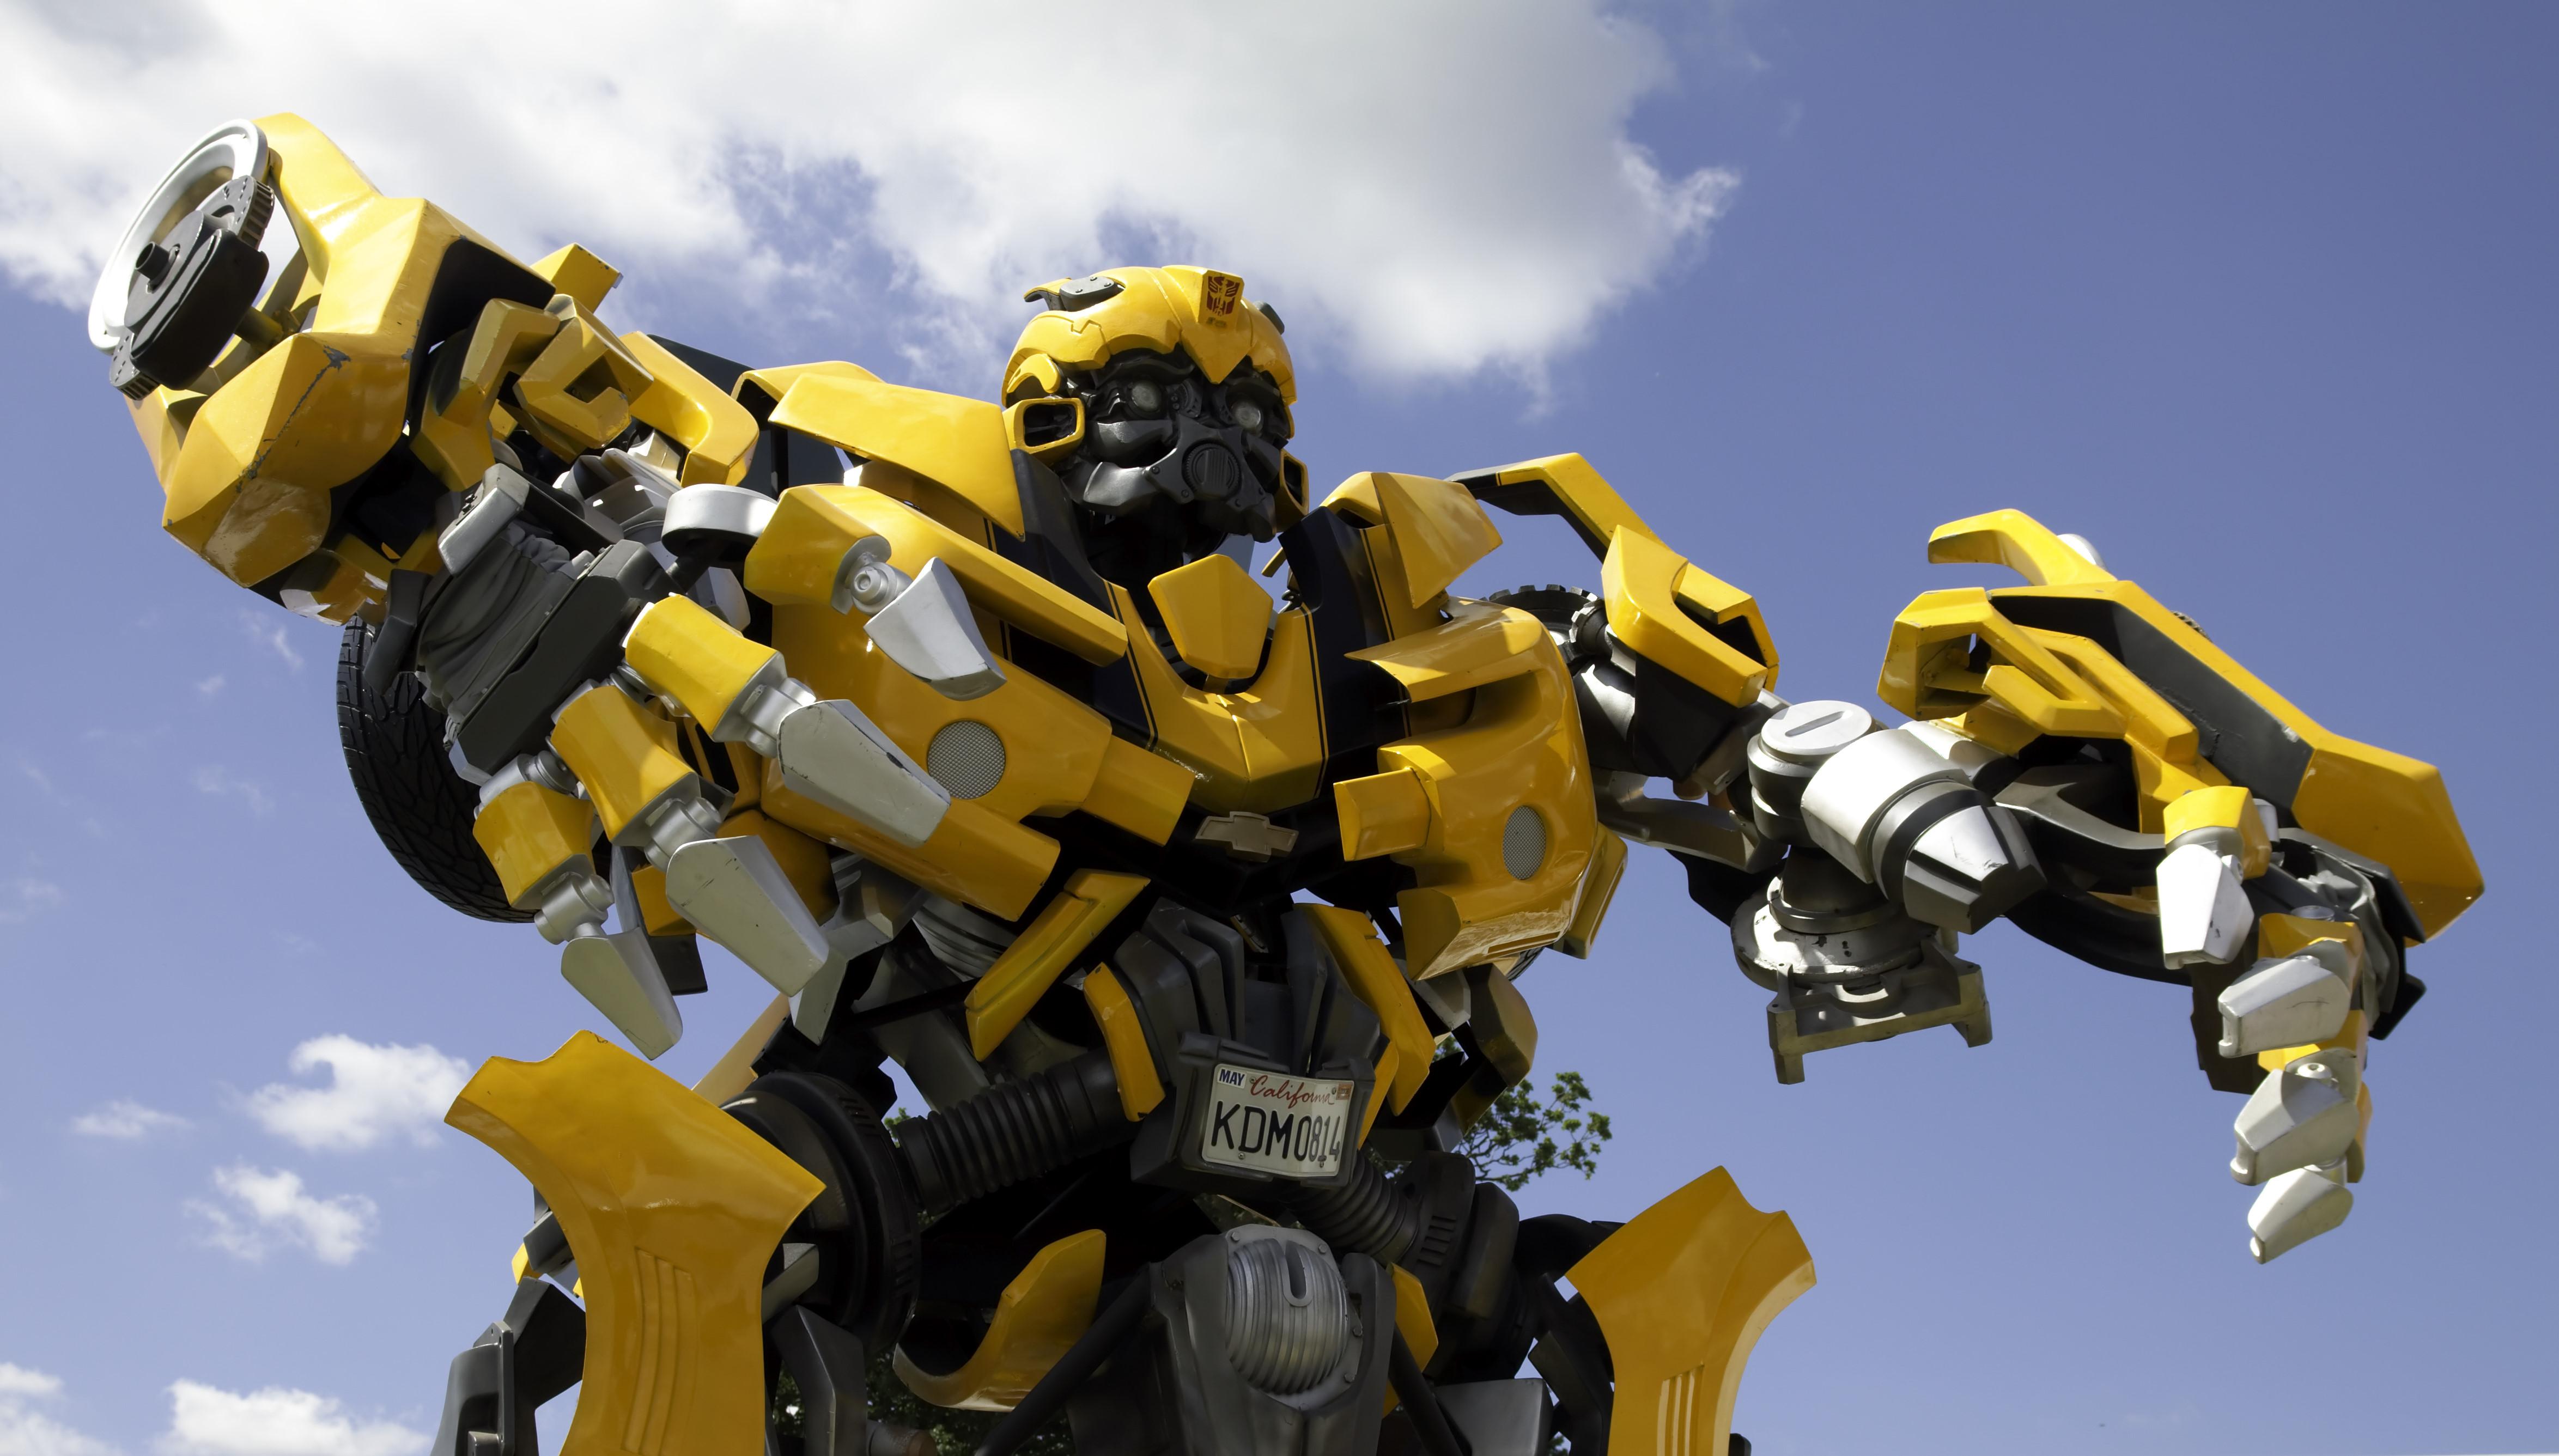 File:Bumblebee Transformer.